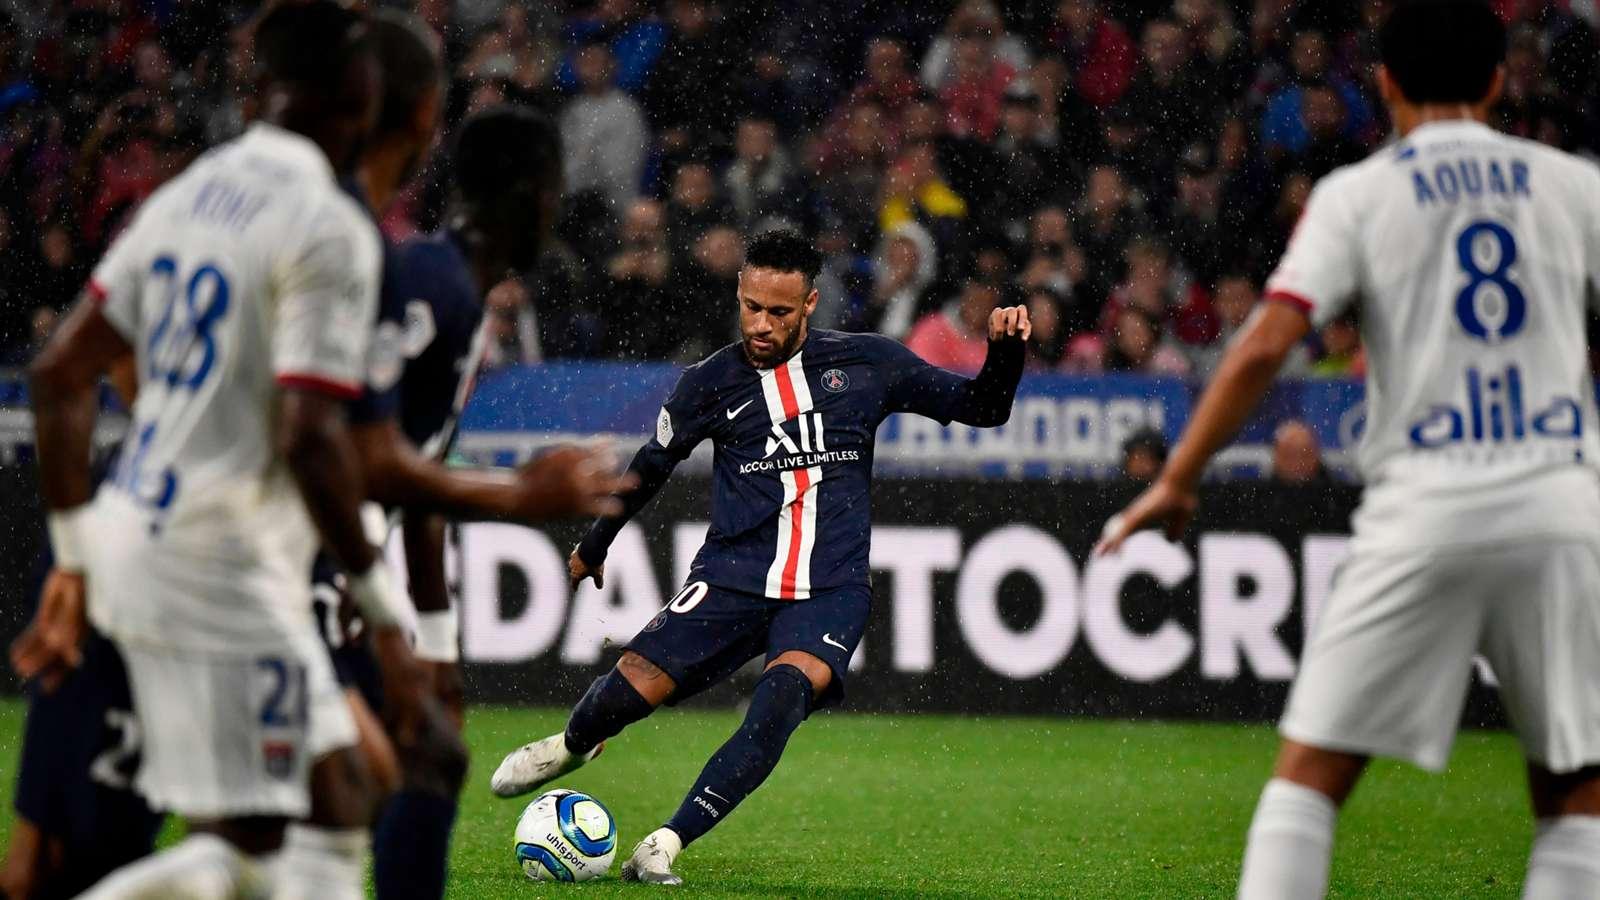 PSG-Brazil-Paris saint Germain-Ligue 1-فرانسه-لوشامپیونه-برزیل-پاری سن ژرمن